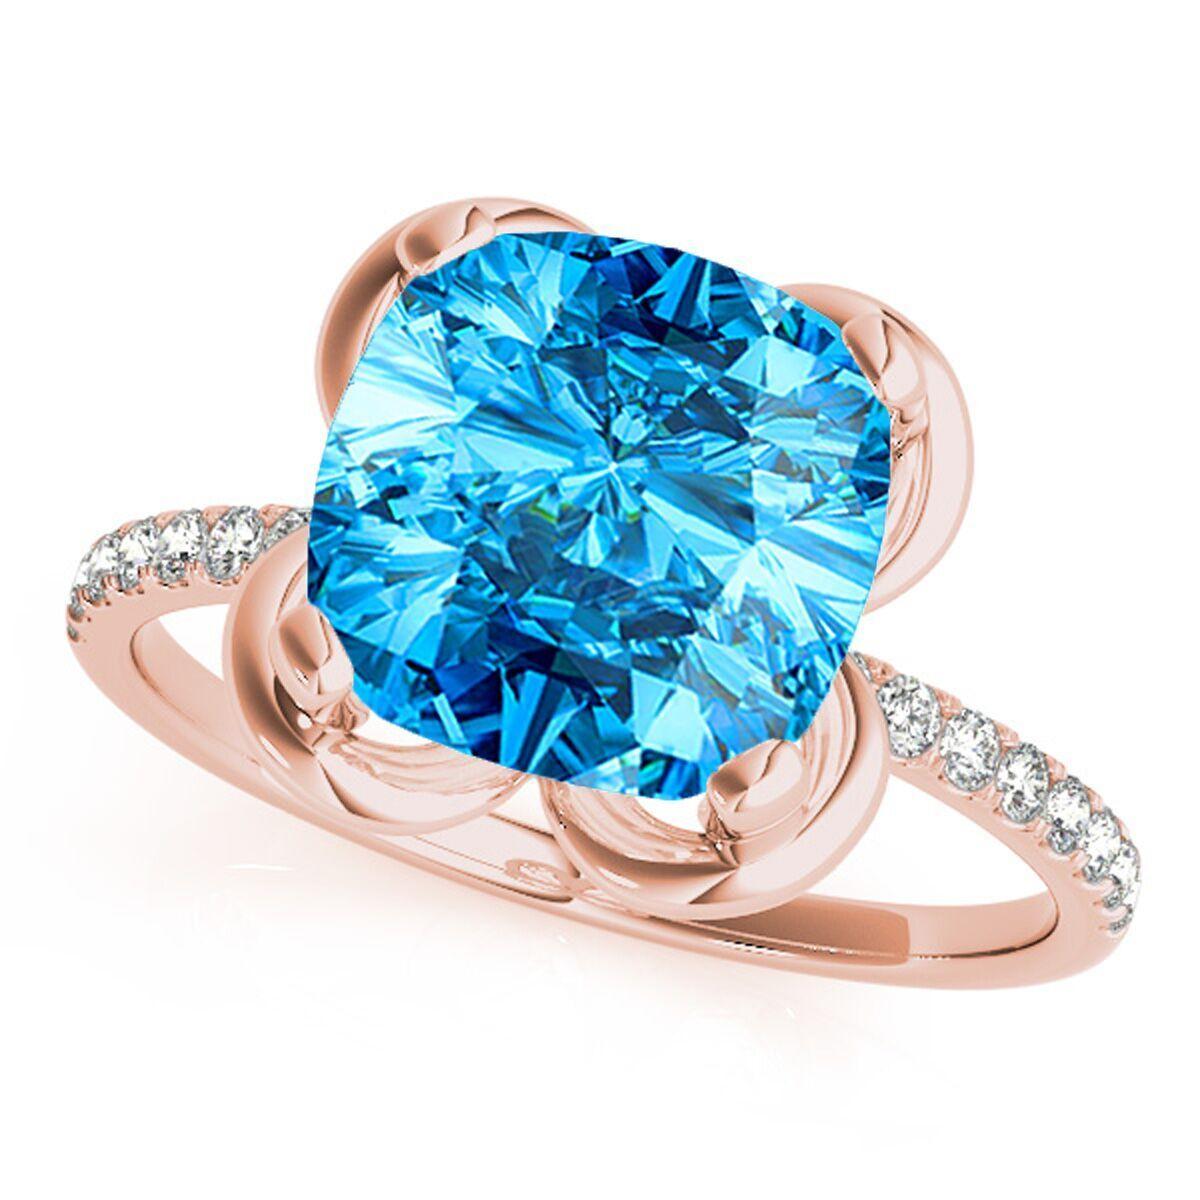 2.25 Ct.Twt Cushion Shape bluee Topaz Diamond Ring In 10K gold